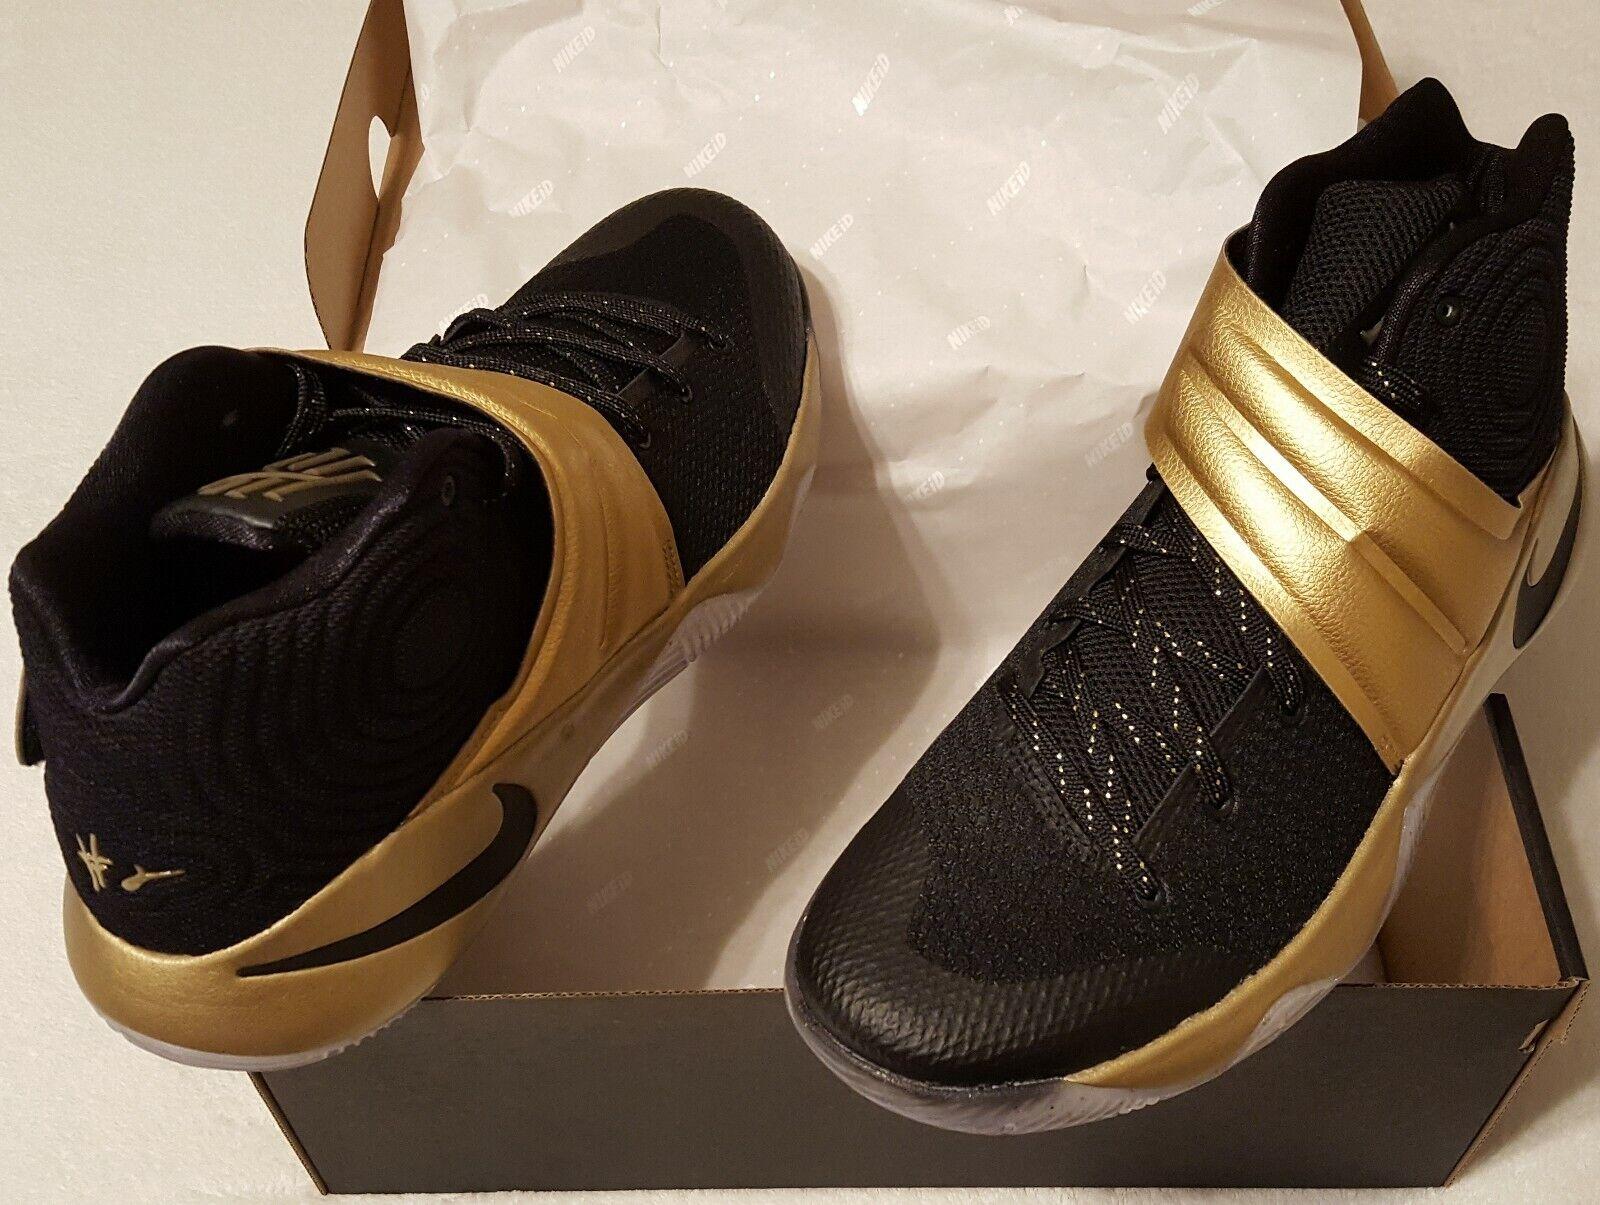 Nike Kyrie 2 Championnat poignard édition spéciale Nike ID 2016 Homme Taille 12